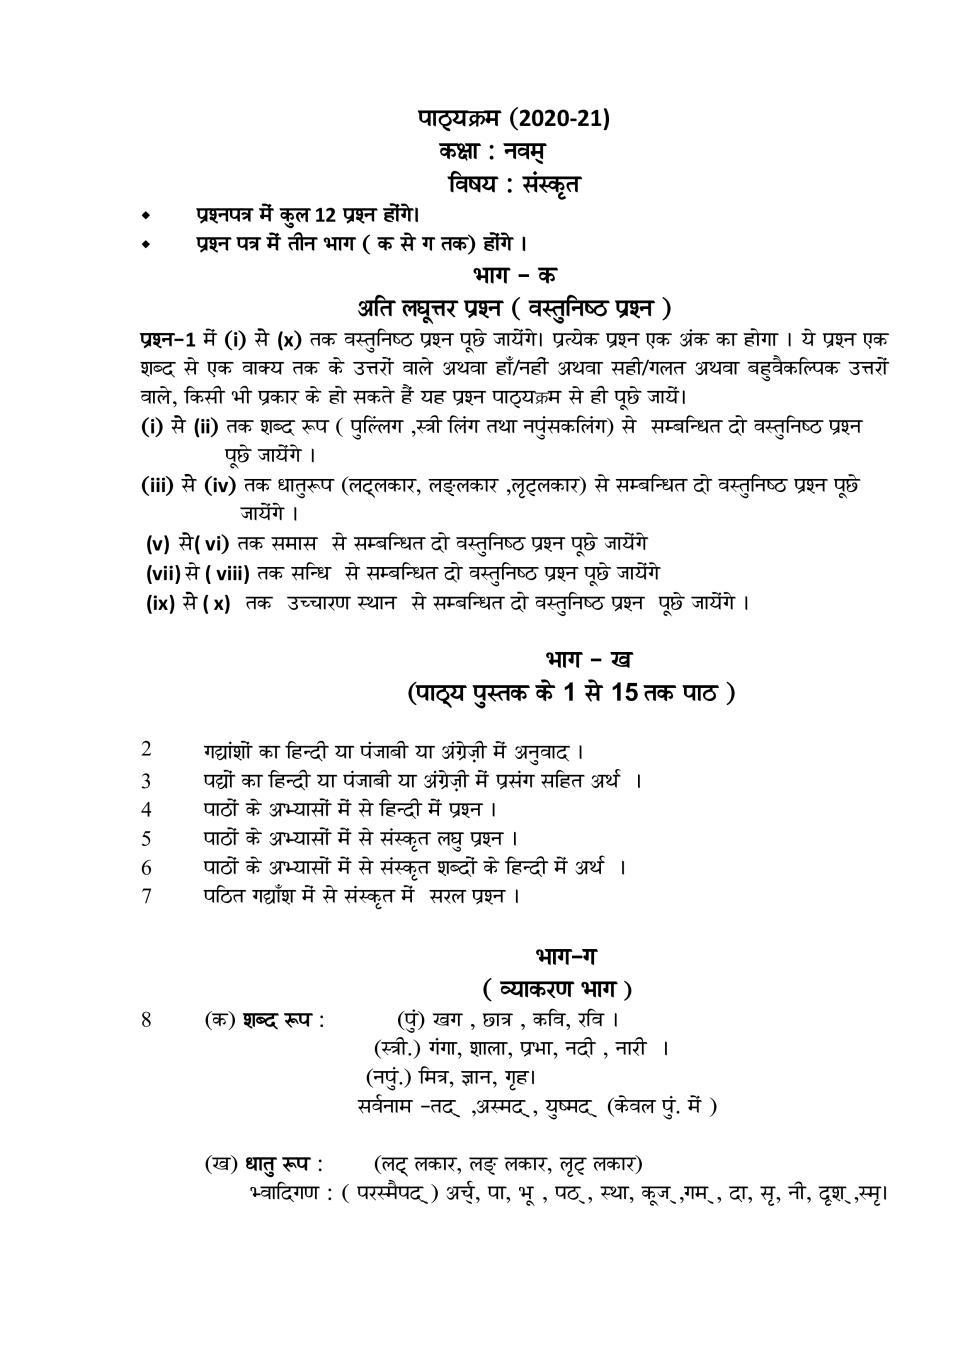 PSEB Syllabus 2020-21 for Class 9 Sanskrit - Page 1